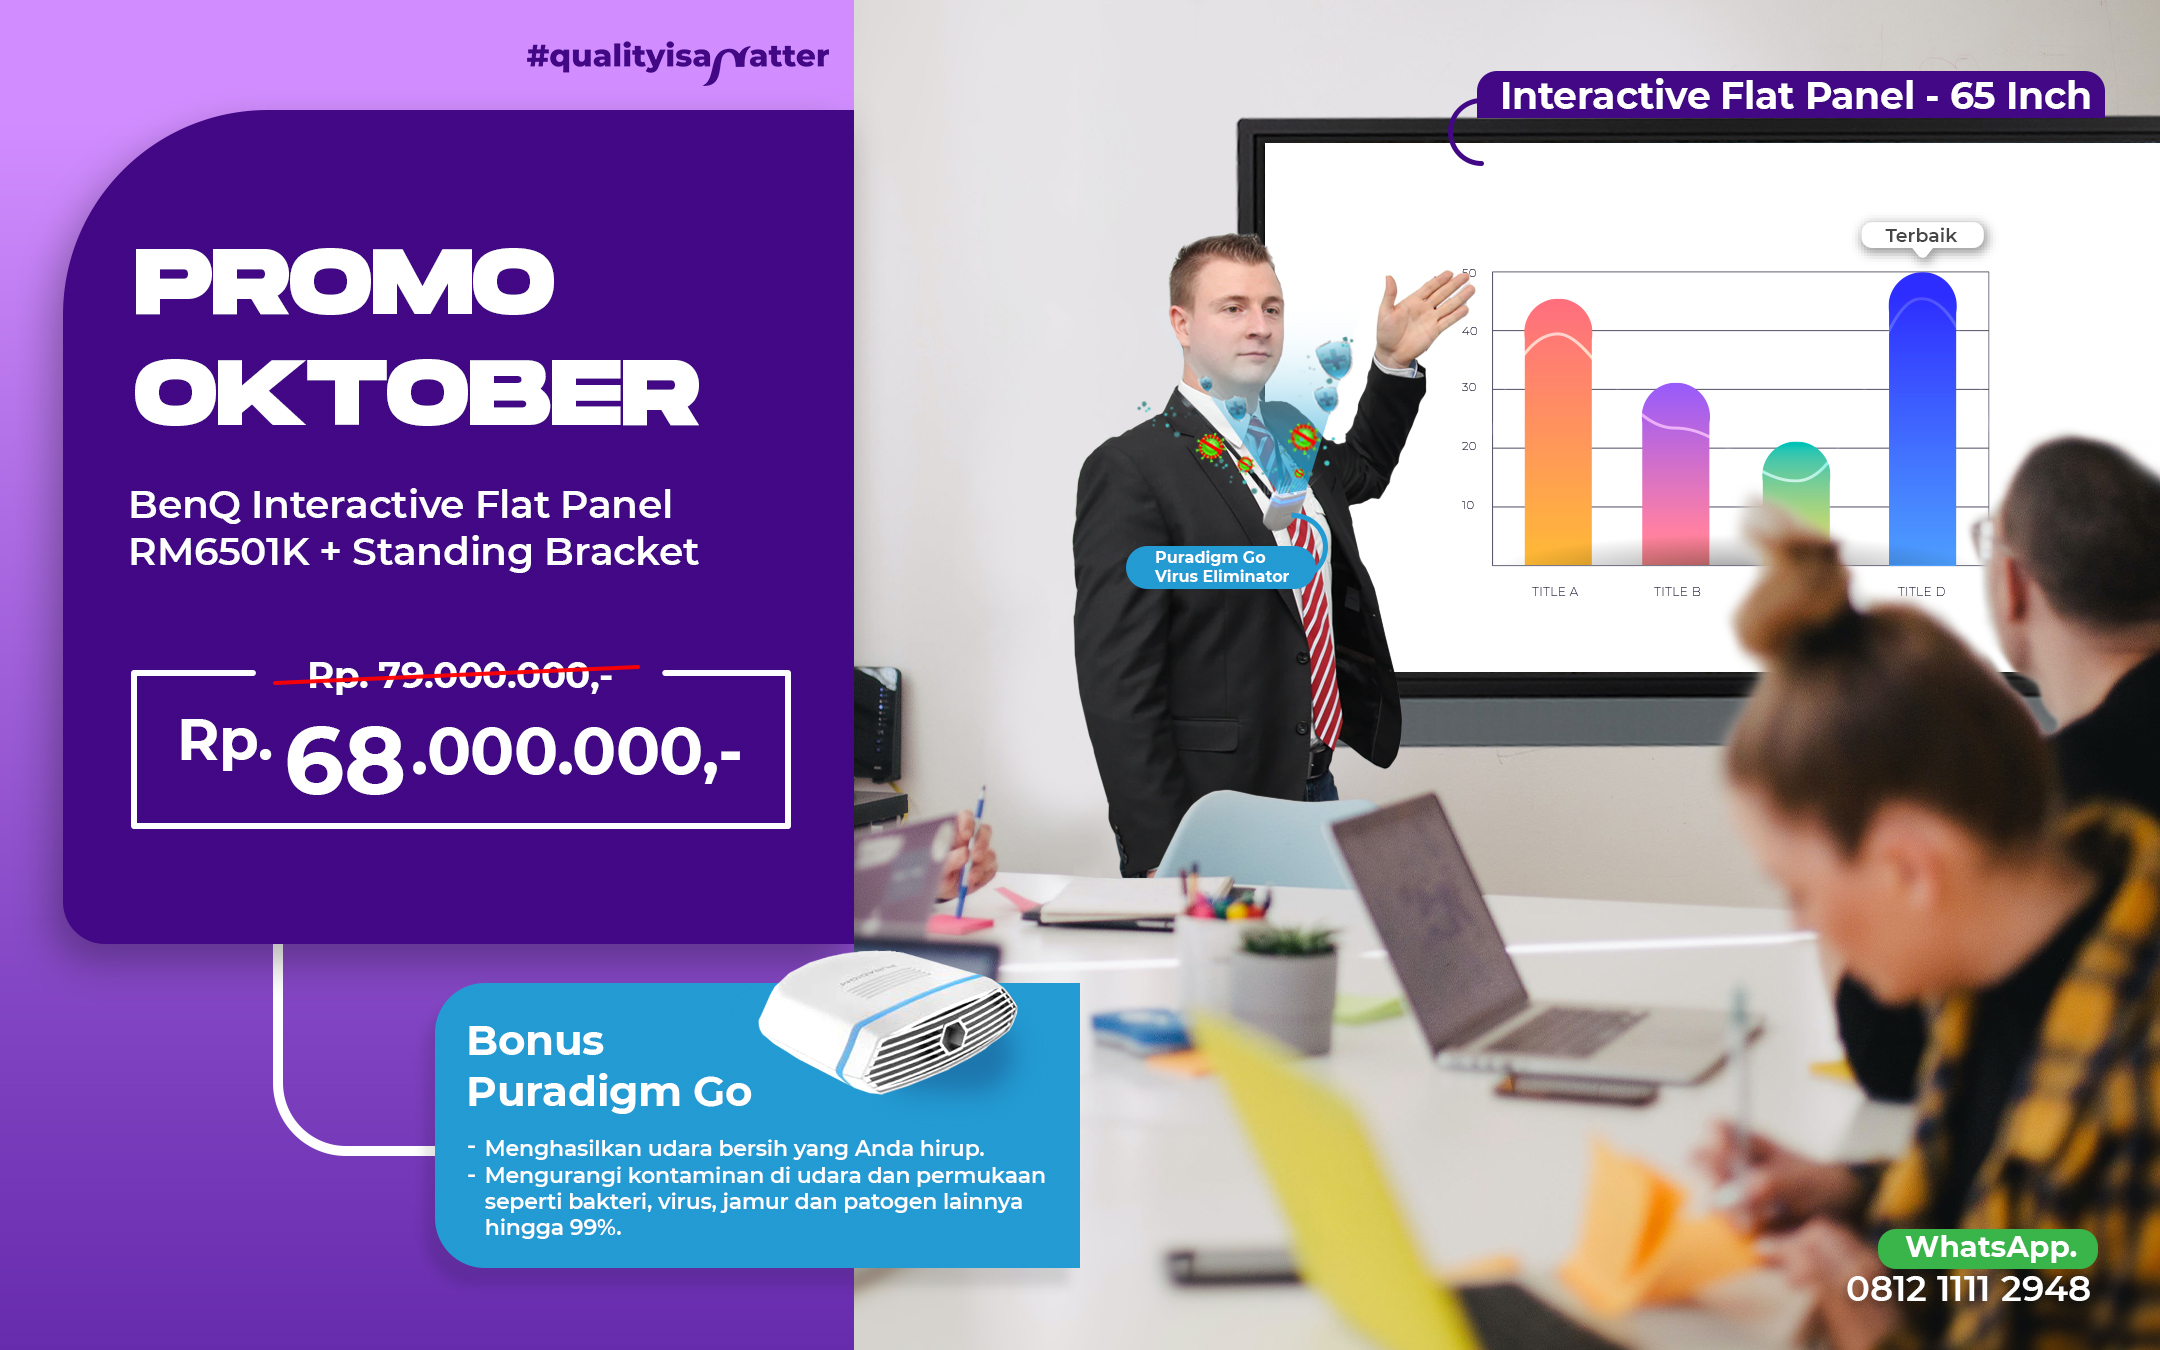 Promo Oktober IFP Bonus Puradigm Final